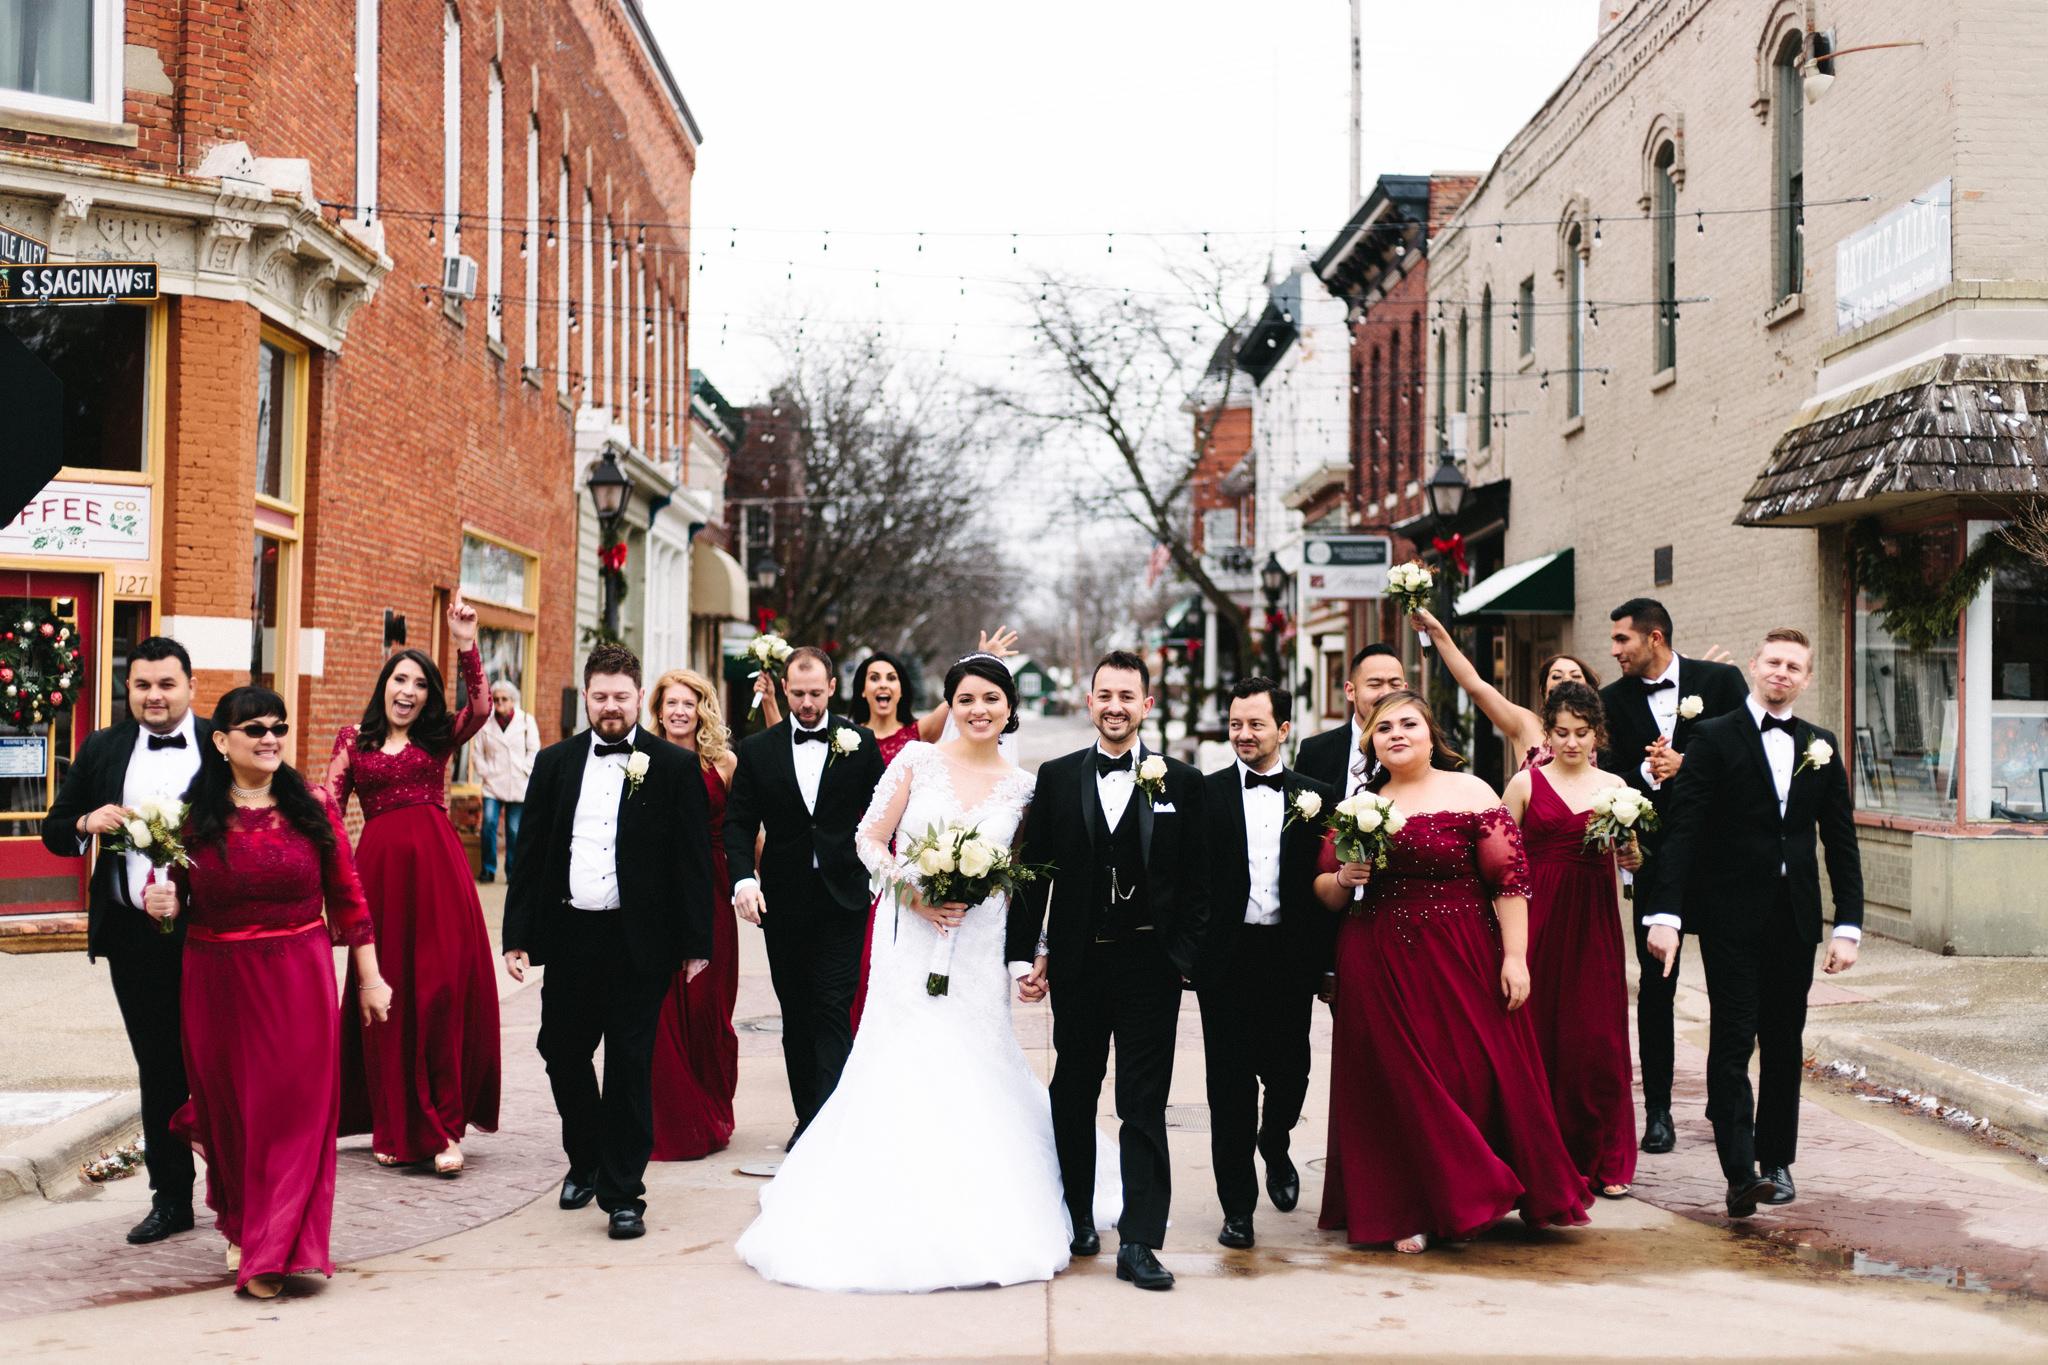 034-rempel-photography-chicago-wedding-inspiration-susan-daniel-michigan-metro-detroit-christian-church-holly-vault-cupcakes-and-kisses.jpg